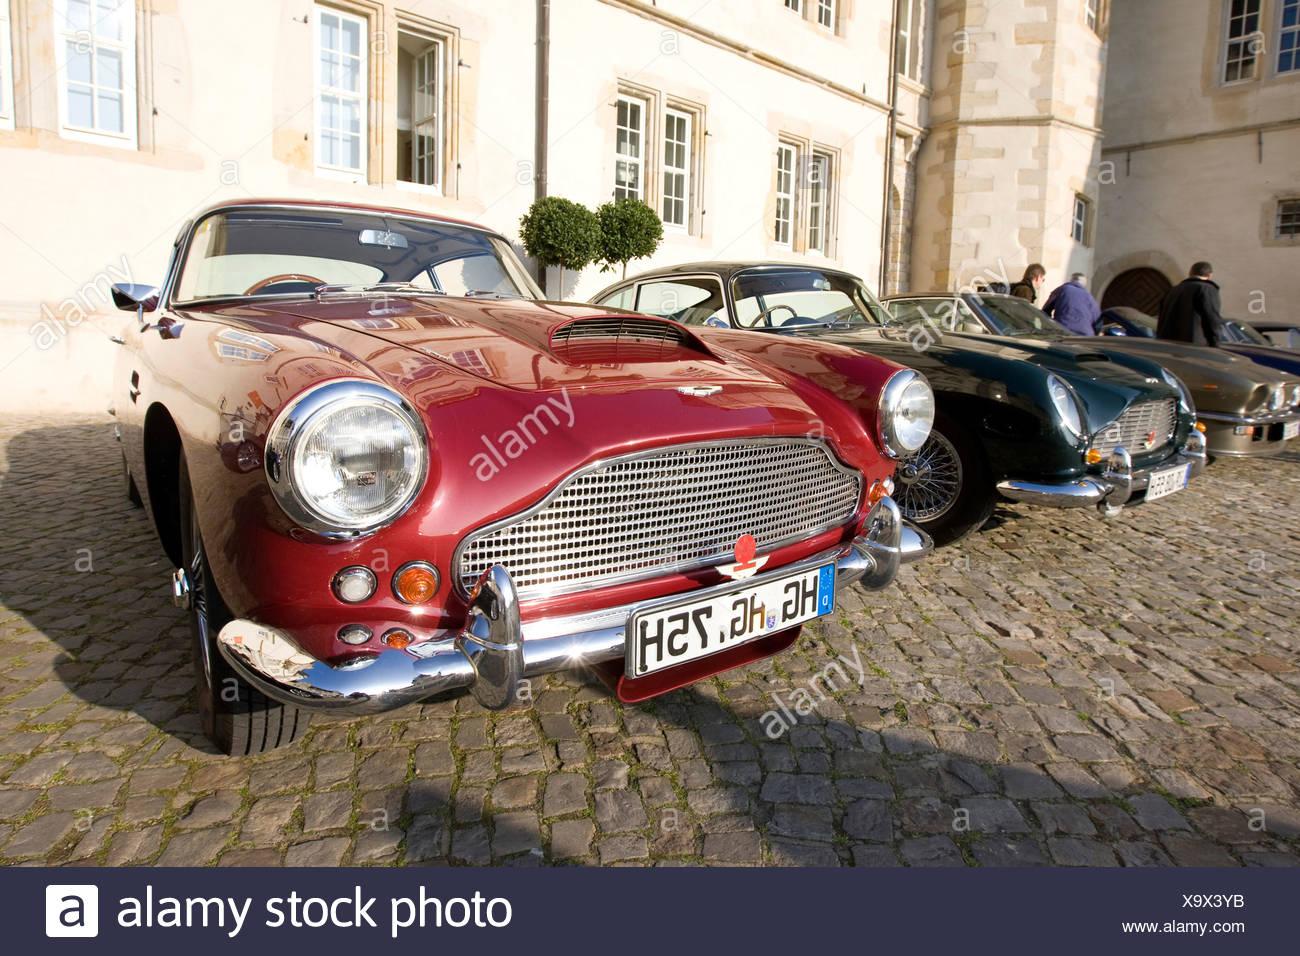 Aston Martin DB Mark III, Aston Martin Meet, Lower Saxony, Germany, Europe - Stock Image